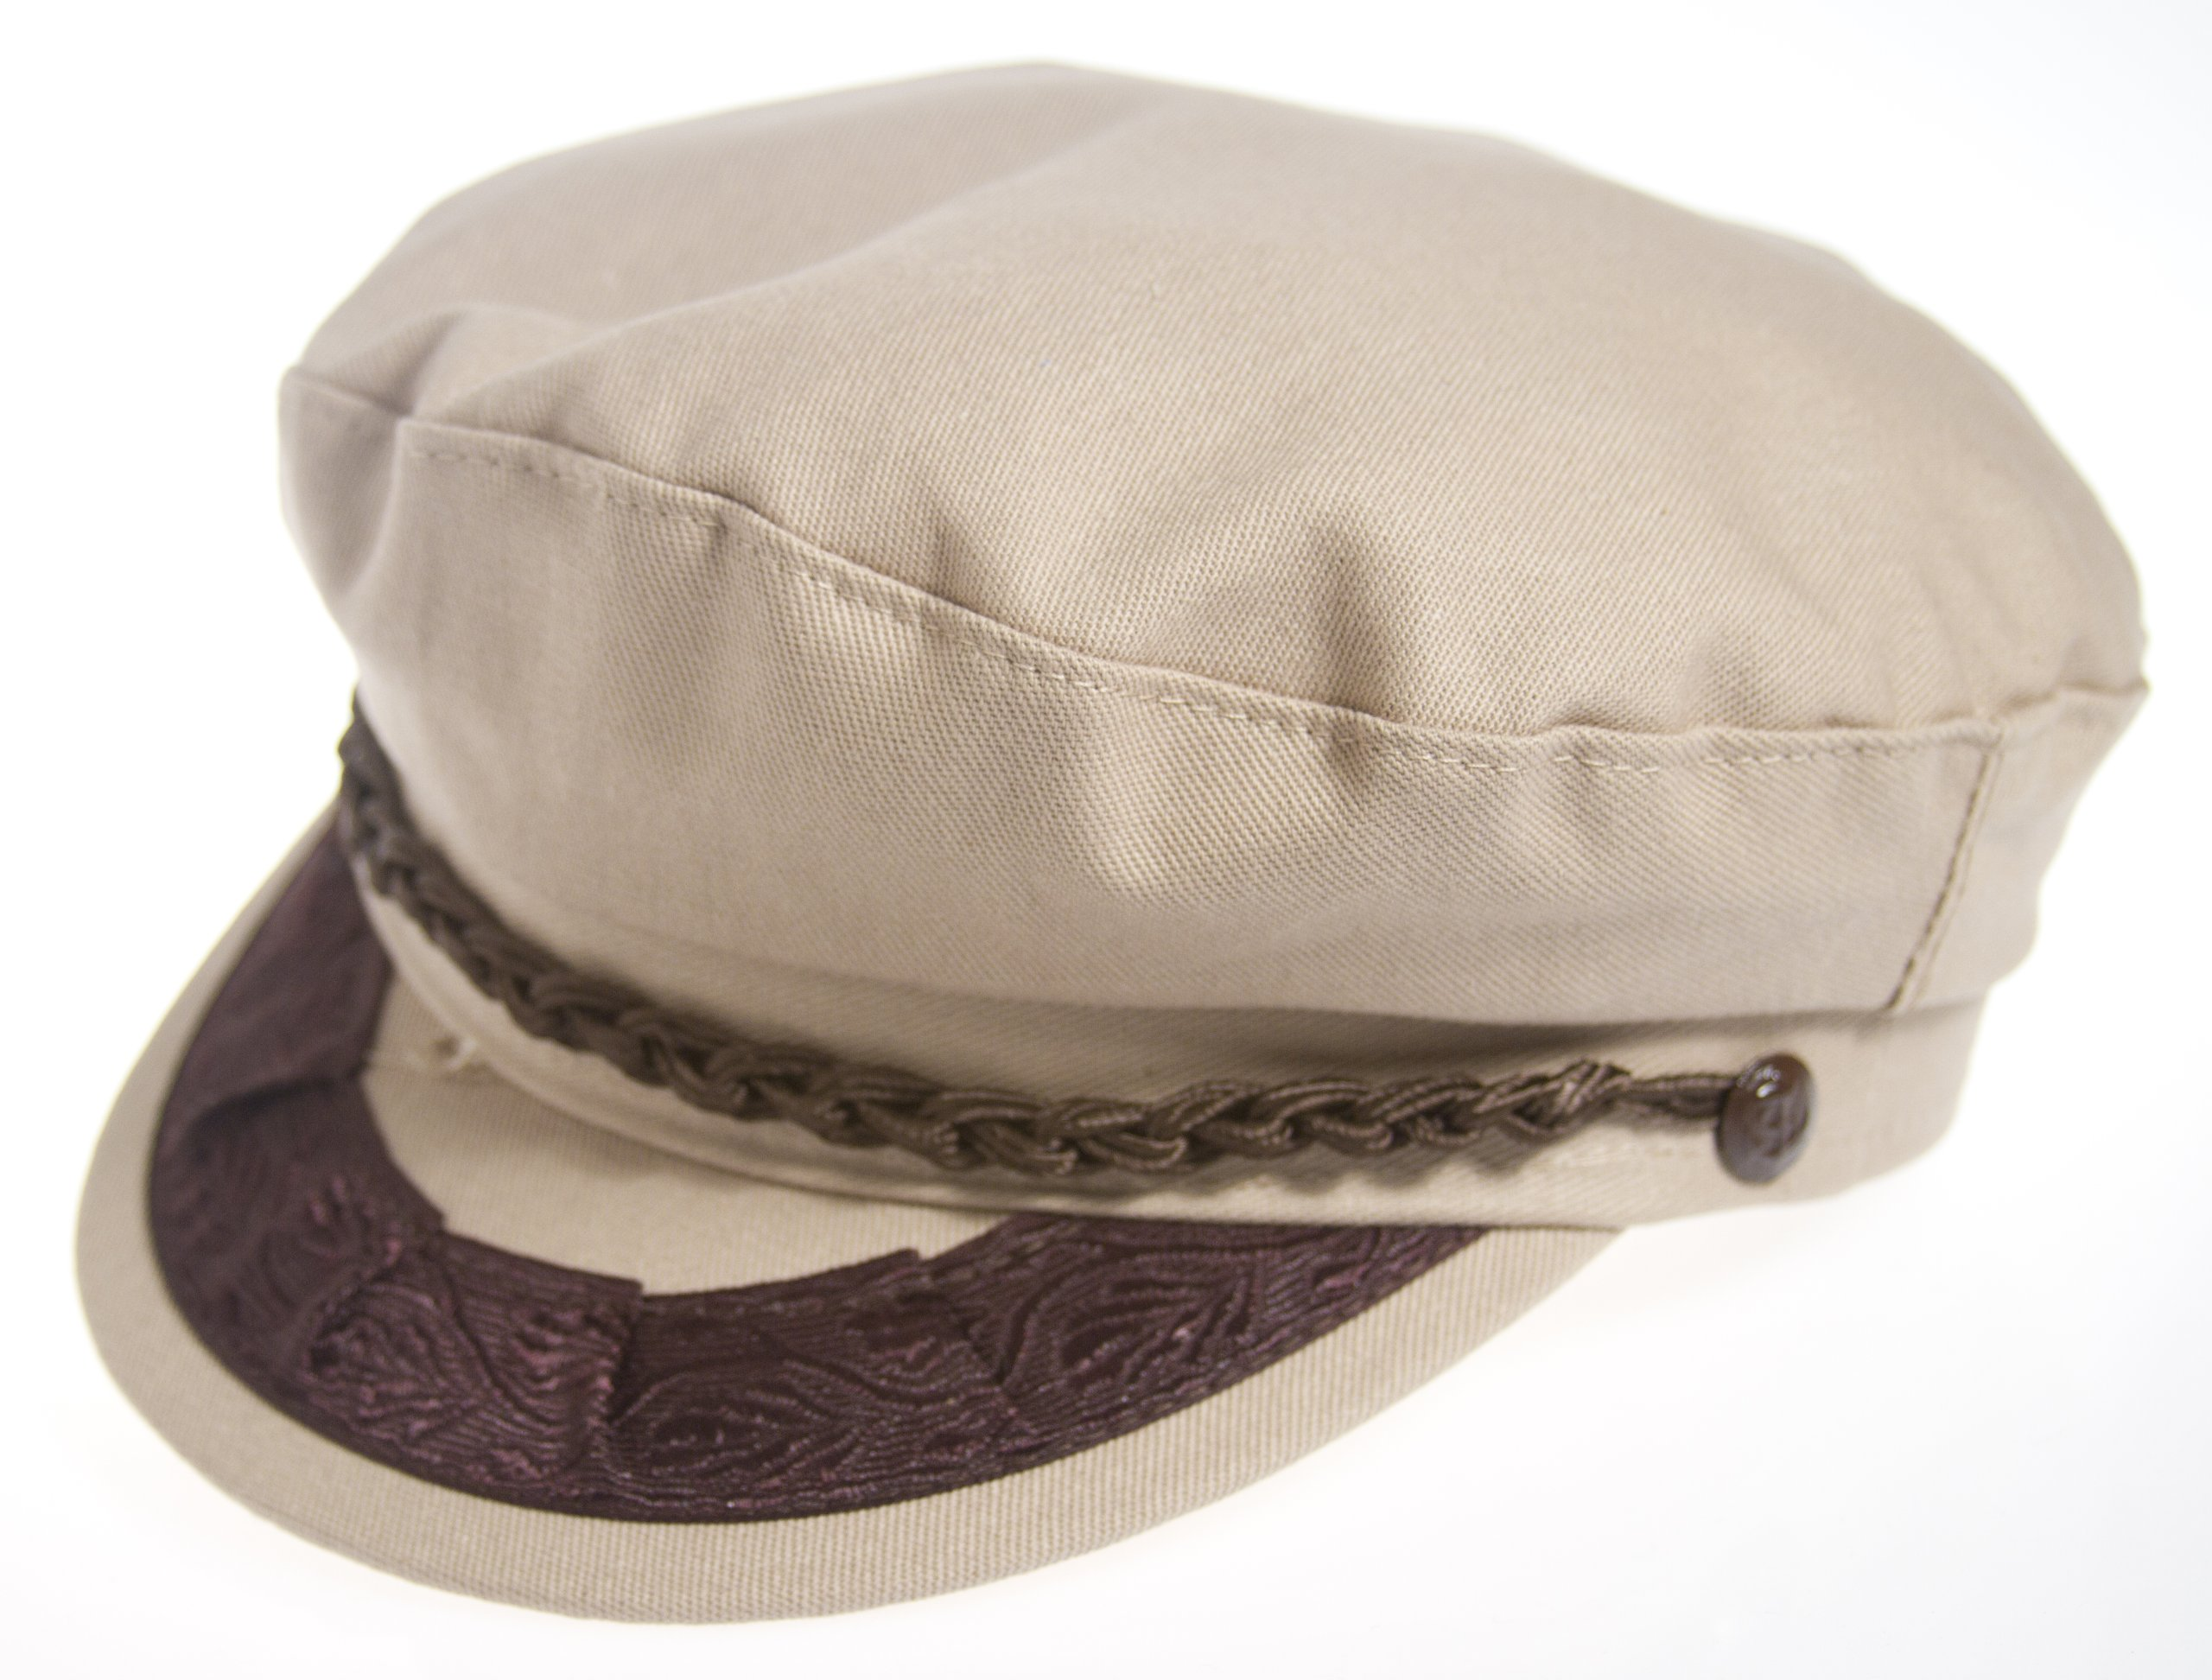 Authentic Greek Fisherman's Cap - Cotton - Khaki - Size 62 - (7 3/4)